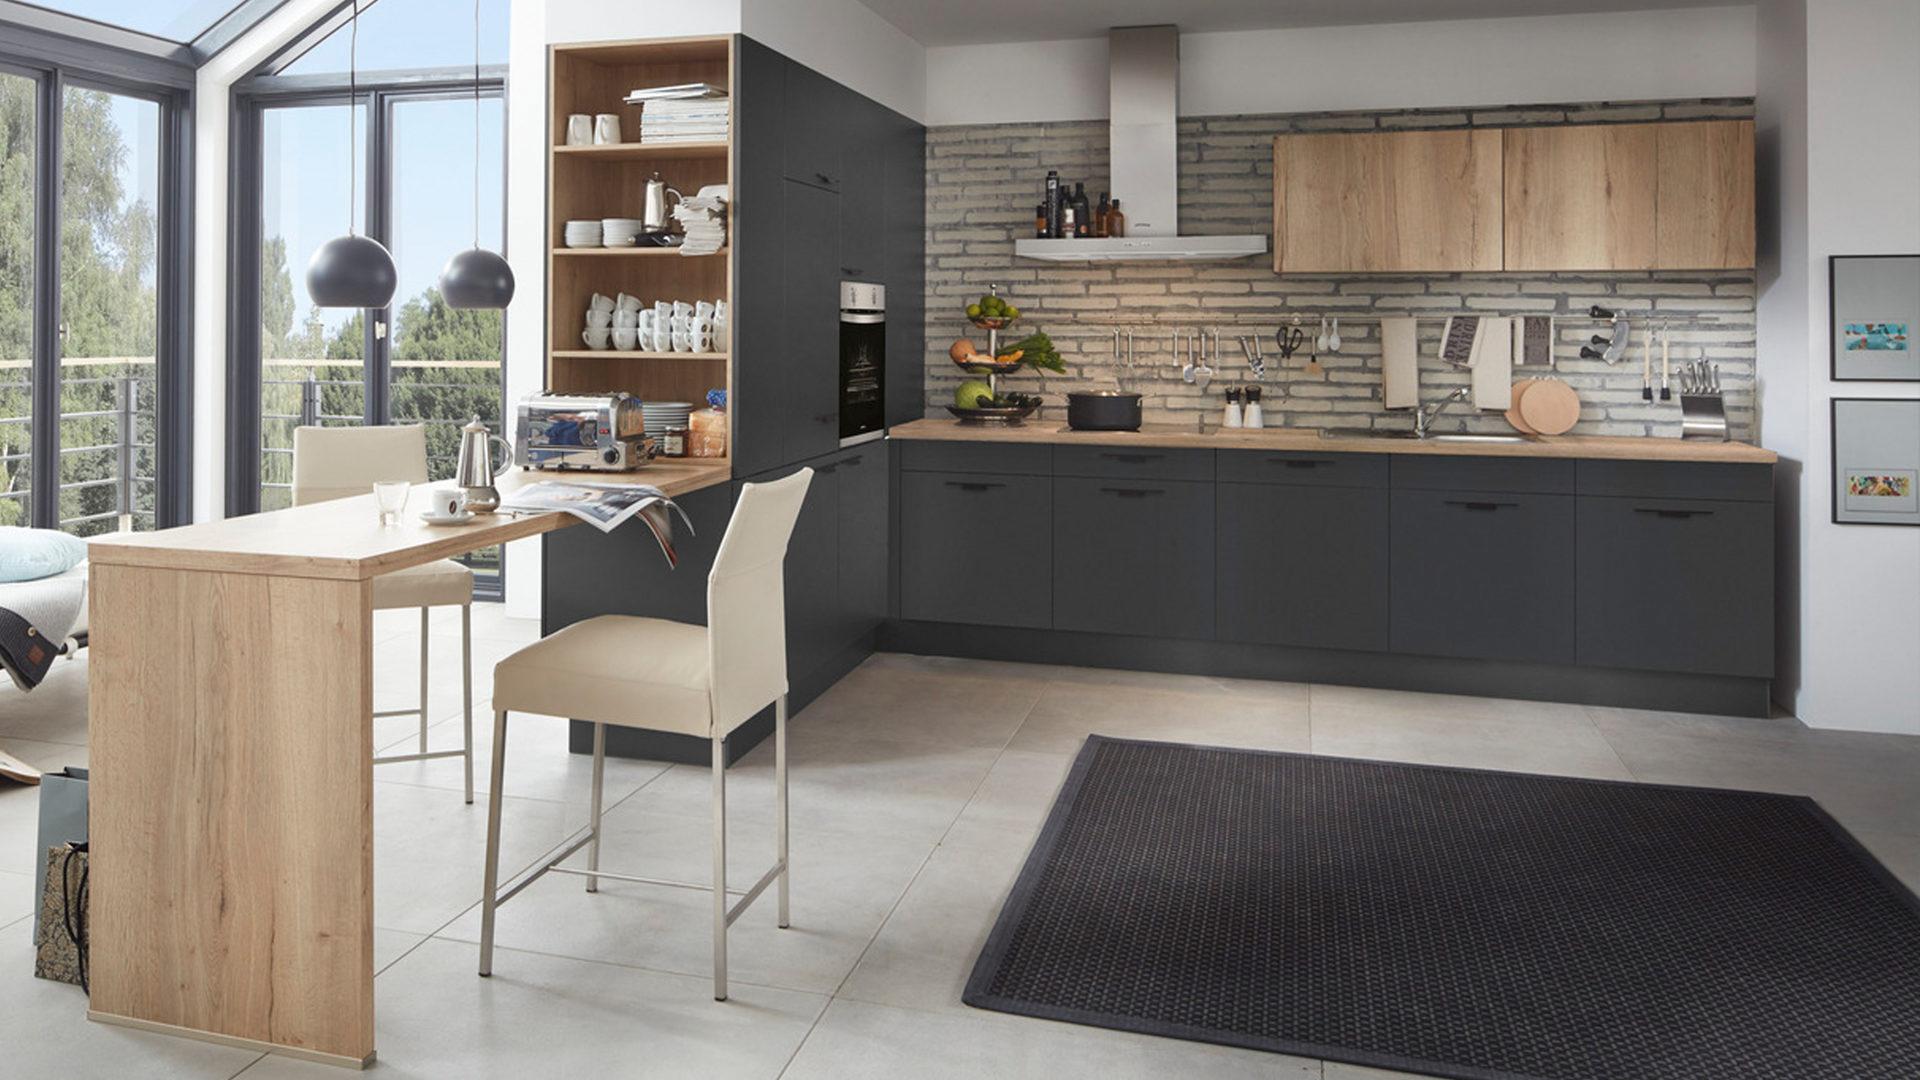 Möbel Boer Coesfeld   Räume   Küche   Einbauküche   Einbauküche ...